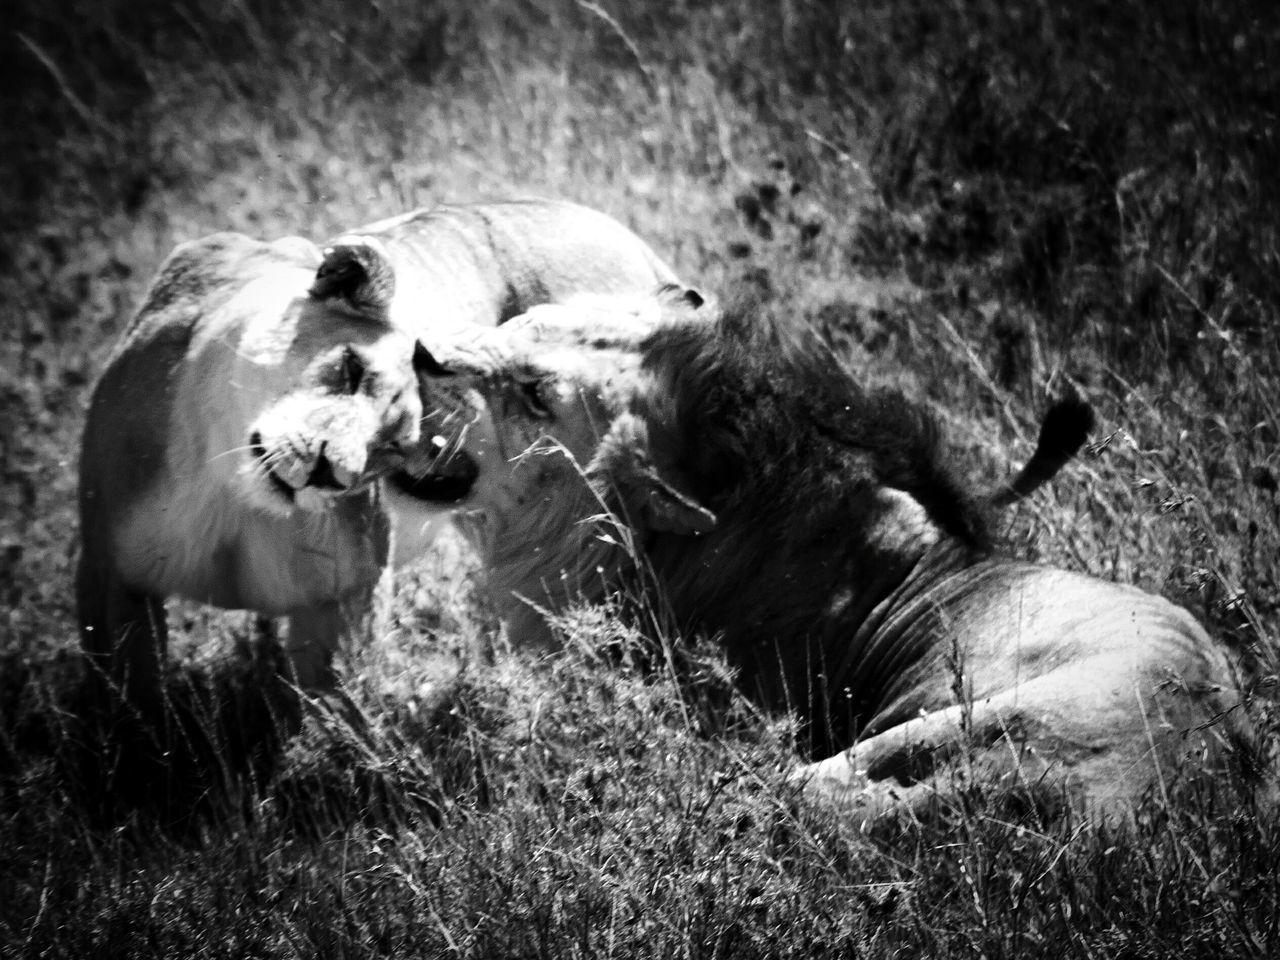 Grass Animal Themes No People Mammal Nature Outdoors Serengeti National Park Tanzania Safari Animals Animals In The Wild Animal Wildlife Lion Love